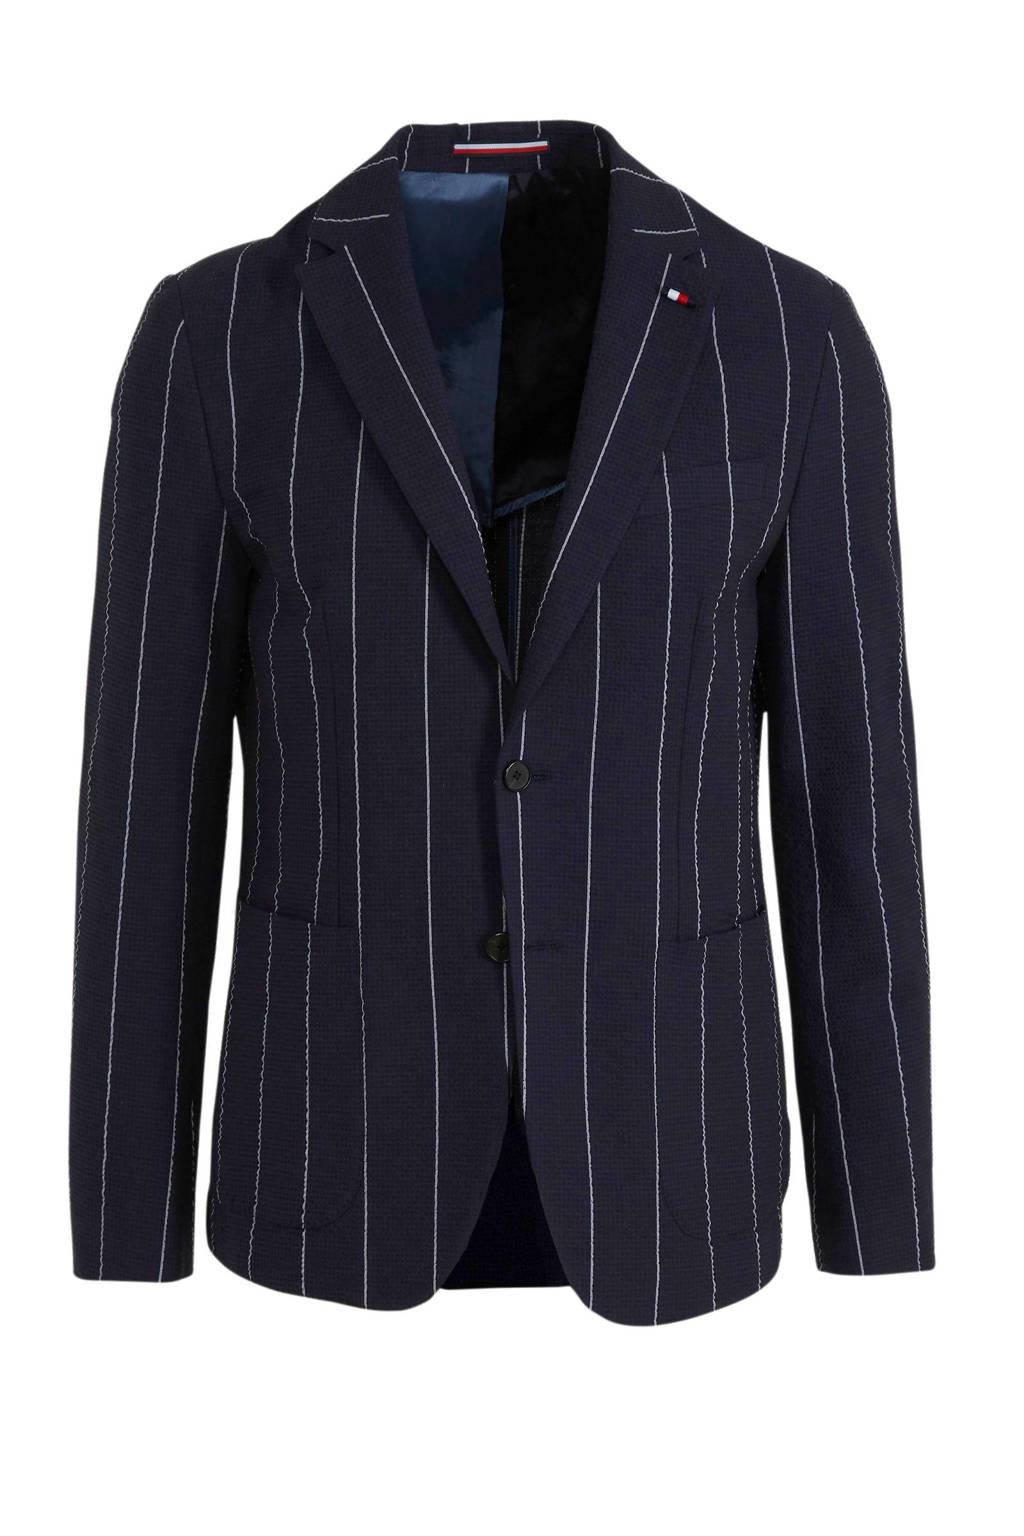 Tommy Hilfiger Tailored regular fit colbert met krijtstreep marine/wit, Marine/wit